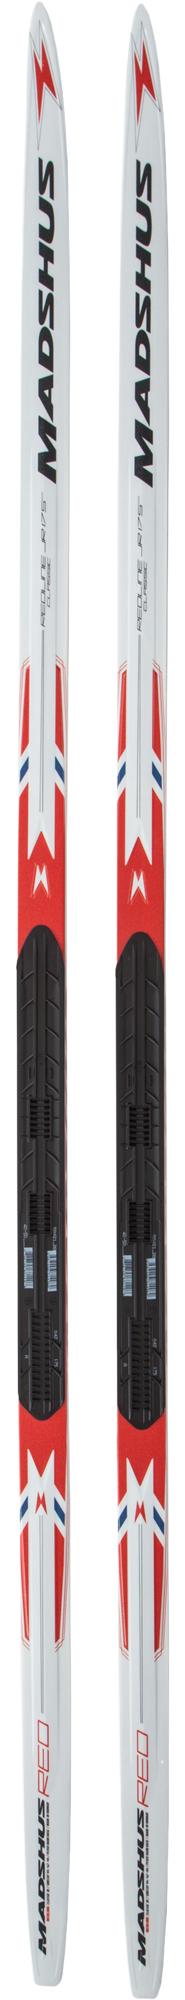 цена Madshus Беговые лыжи детские Madshus Redline Carbon Classic Jr, размер 175-60